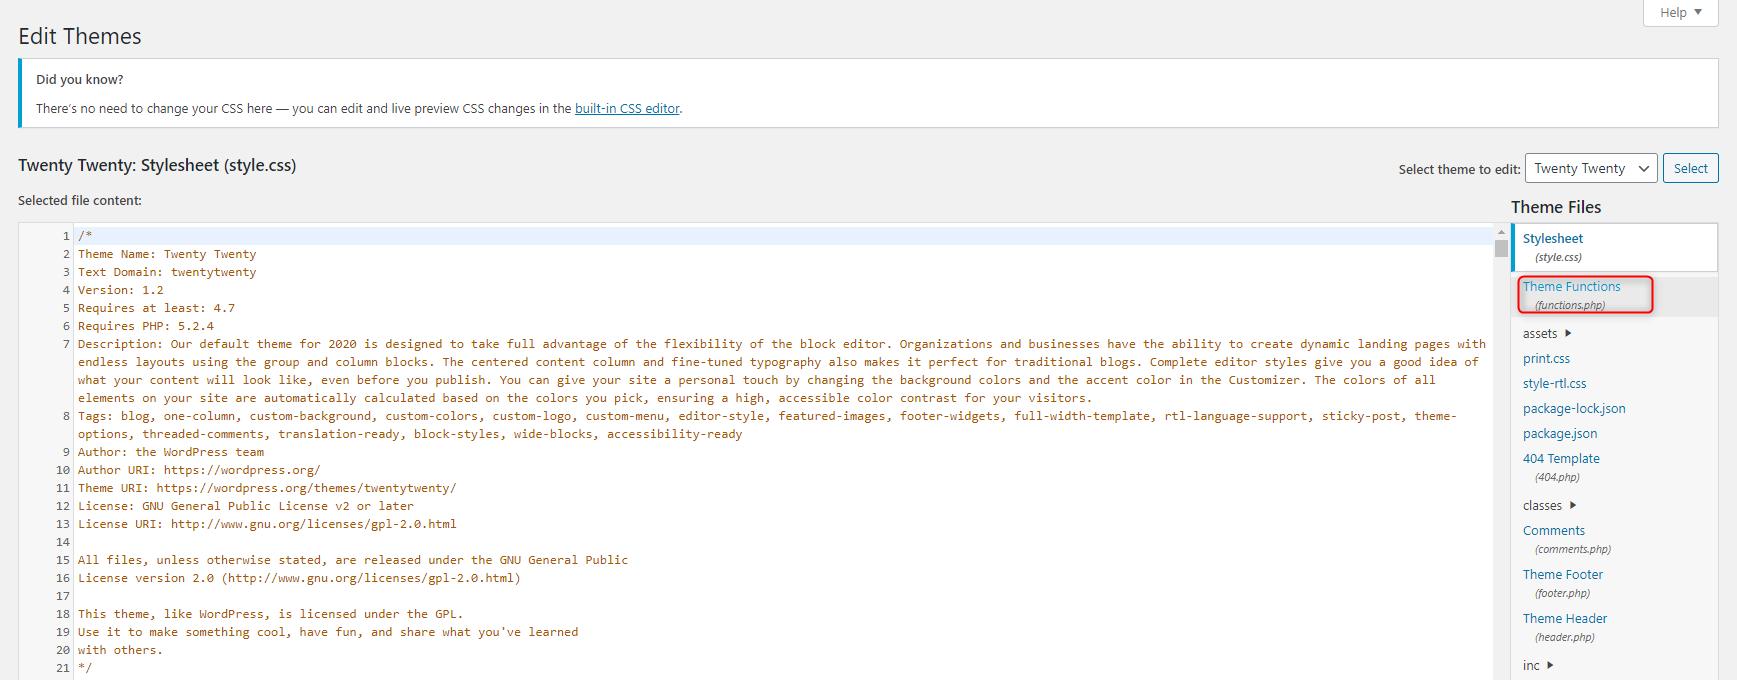 How to Add Custom PHP Code in WordPress - Theme editor